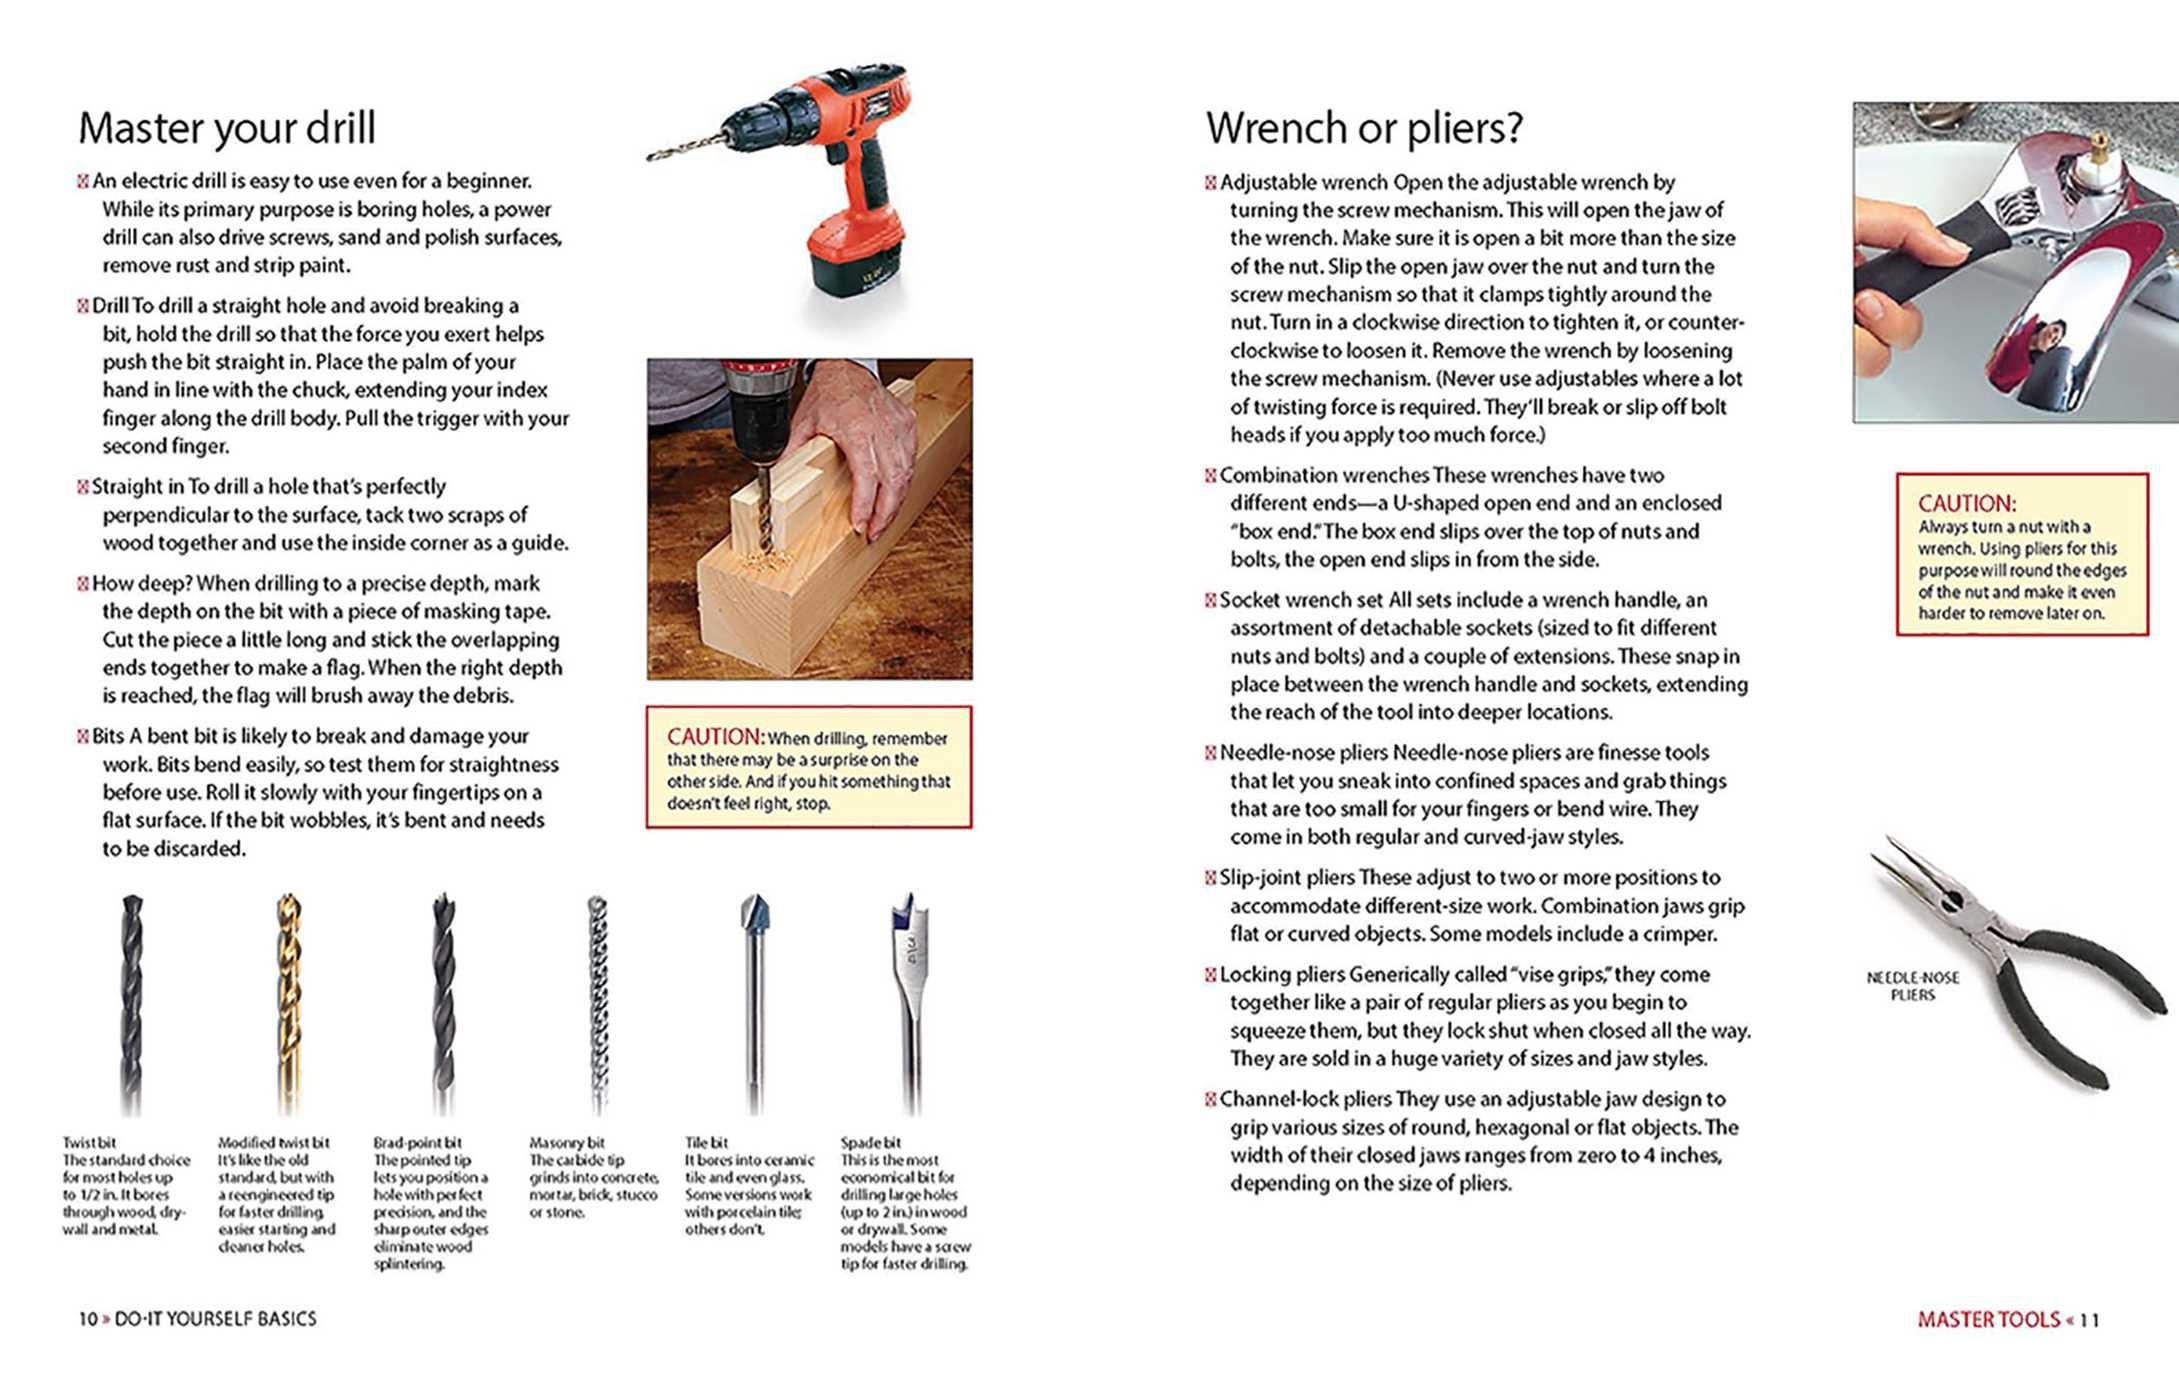 Family handyman do it yourself basics ebook by editors of family family handyman do it yourself basics 978162145353603 solutioingenieria Gallery